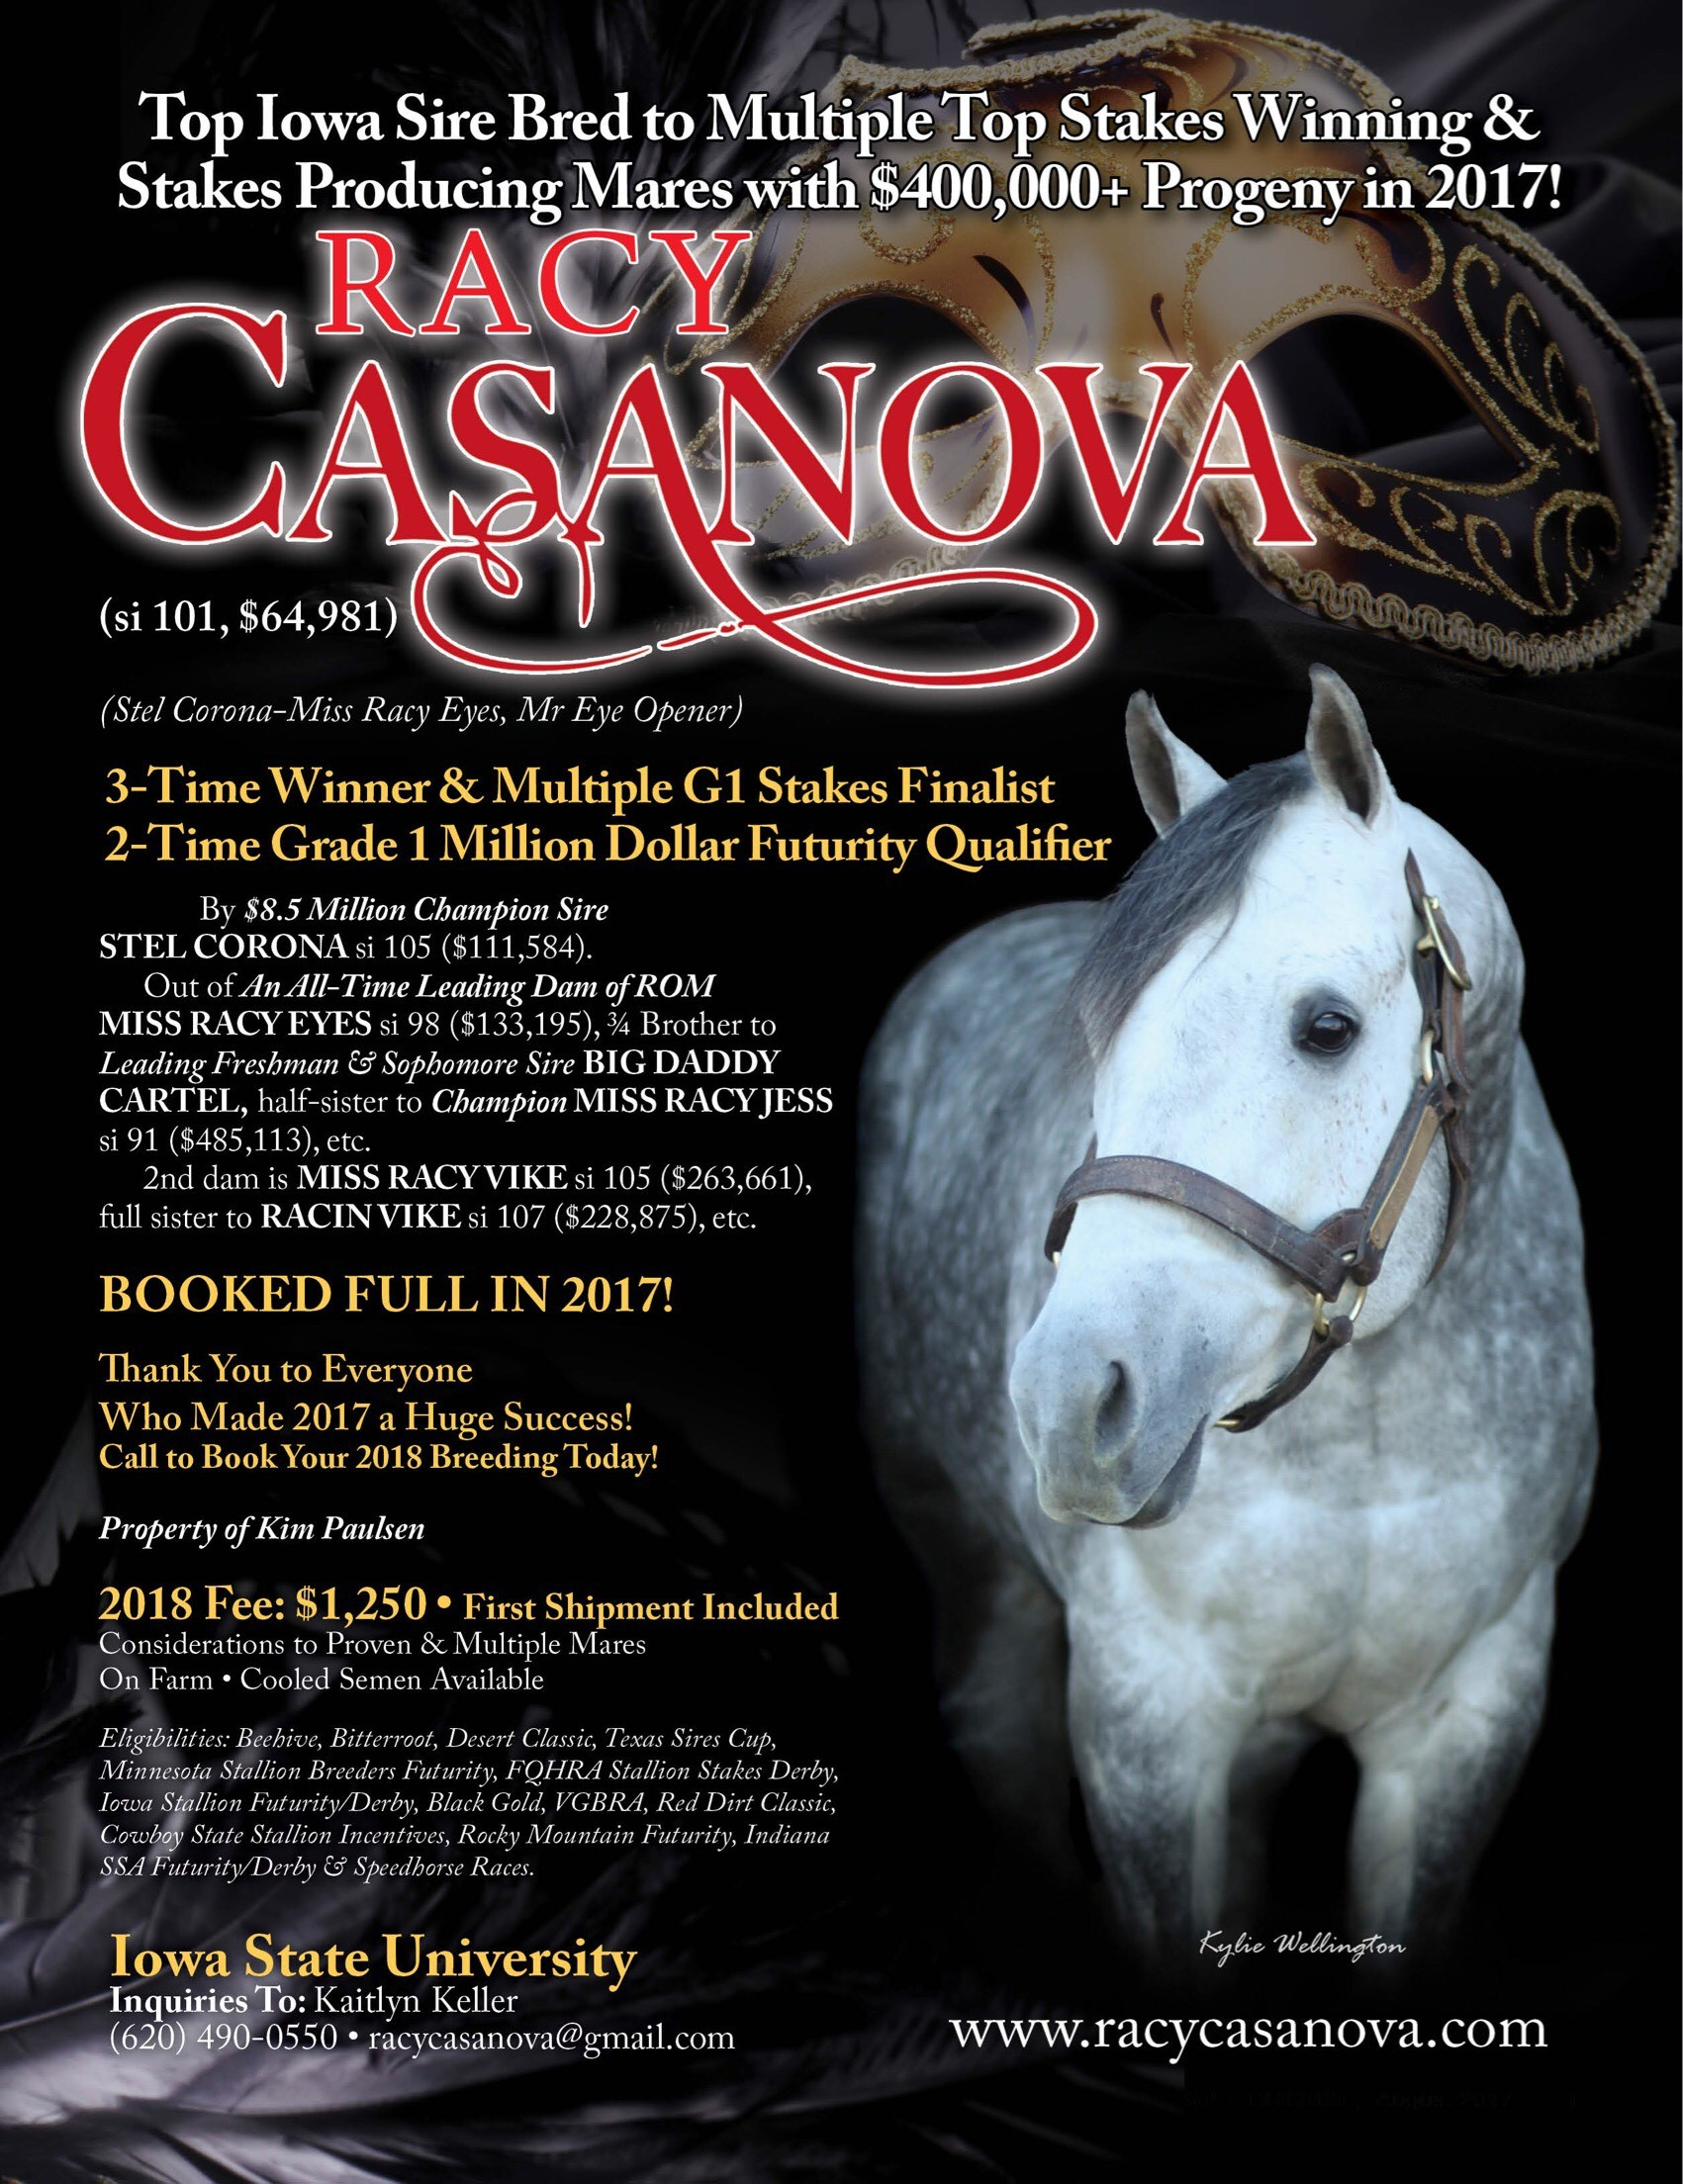 RACY CASANOVA STANDING AT ISU